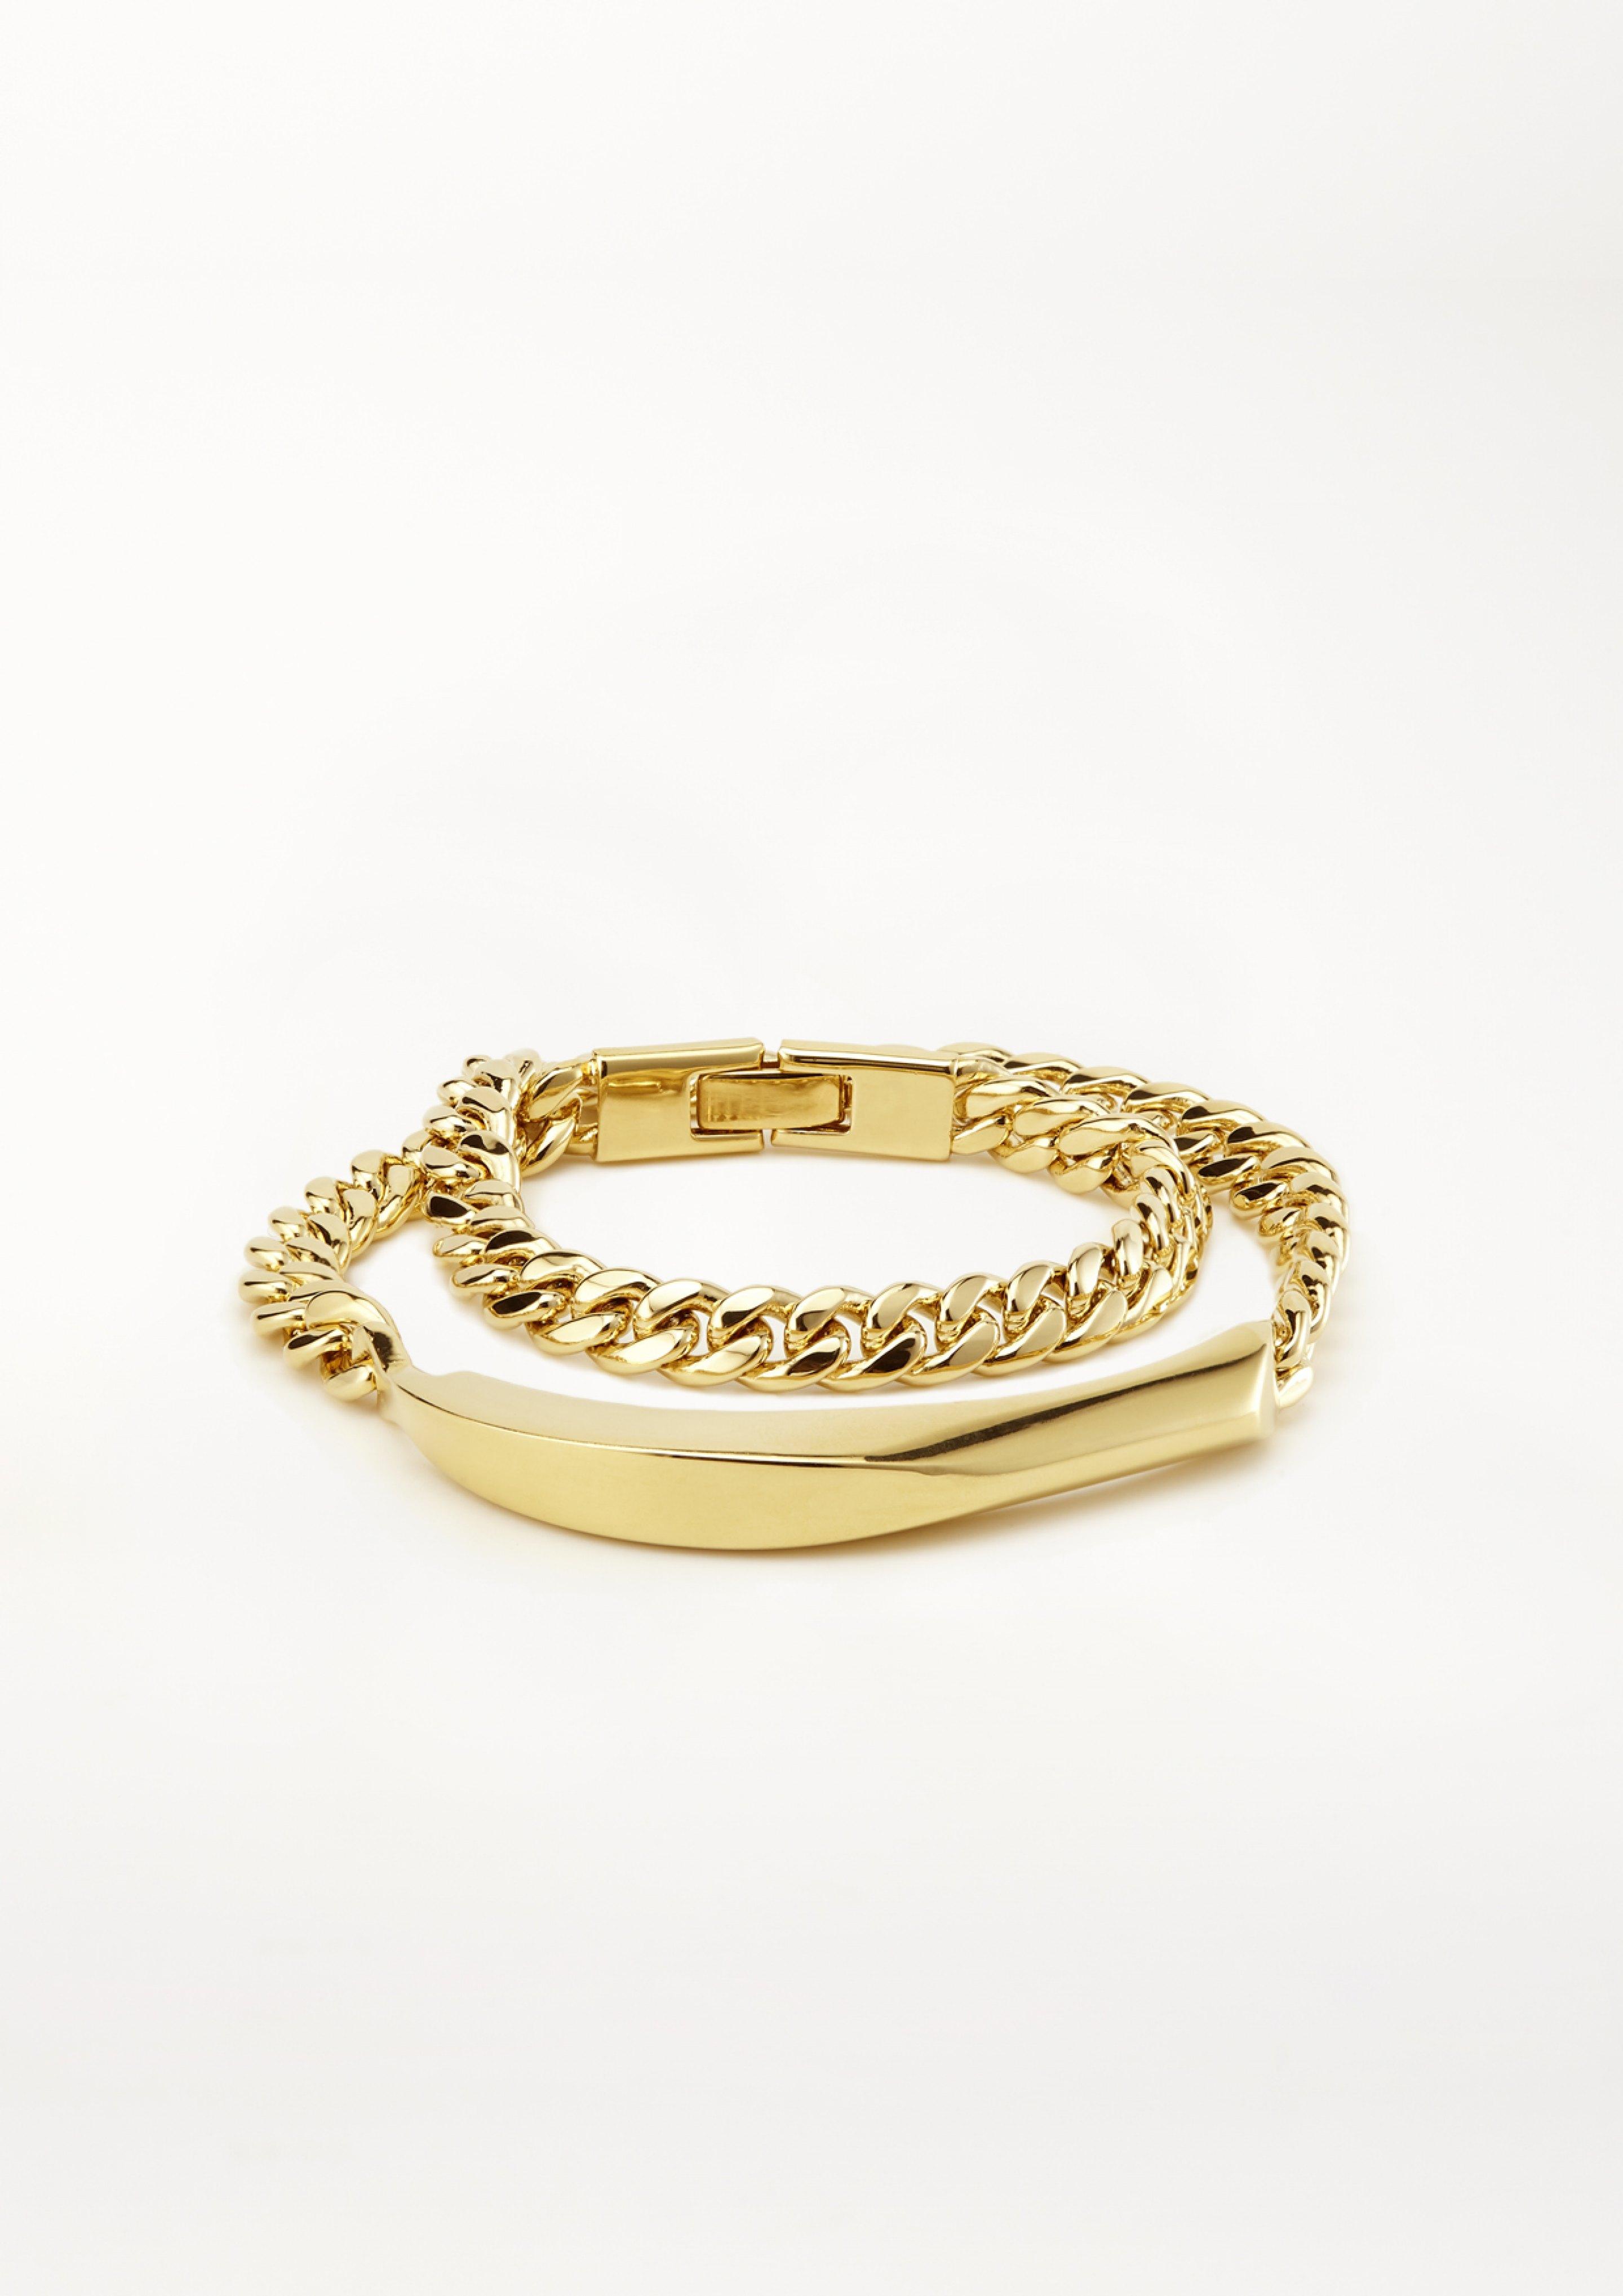 timeless bracelet WASHEDSTONE NR 10 WICKELARMBAND IN GOLD/SILBER KETTENGLIEDER XENIABOUS HANDGEMACHTER SCHMUCK